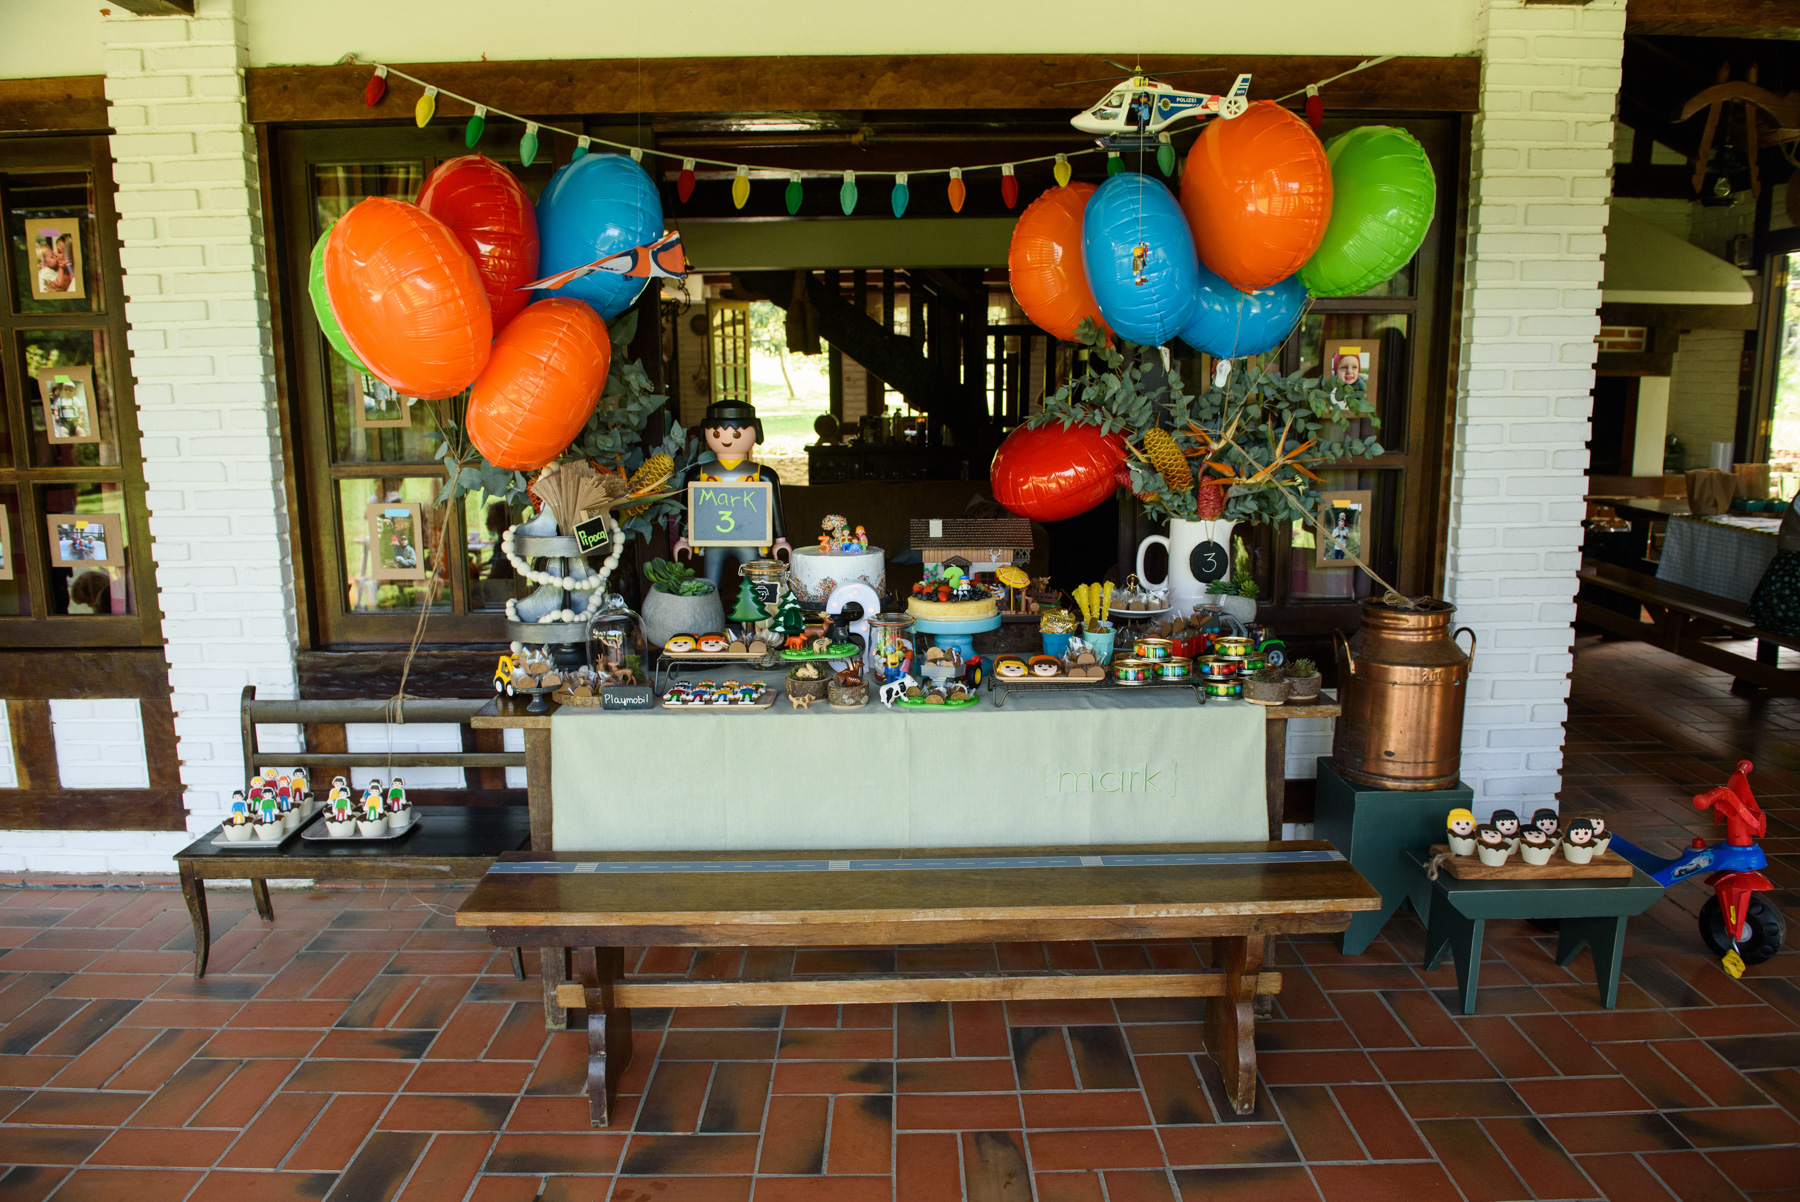 010_aniversario_infantil_blumenau_sc_festa_fazenda_homemade_3anos_mark.jpg